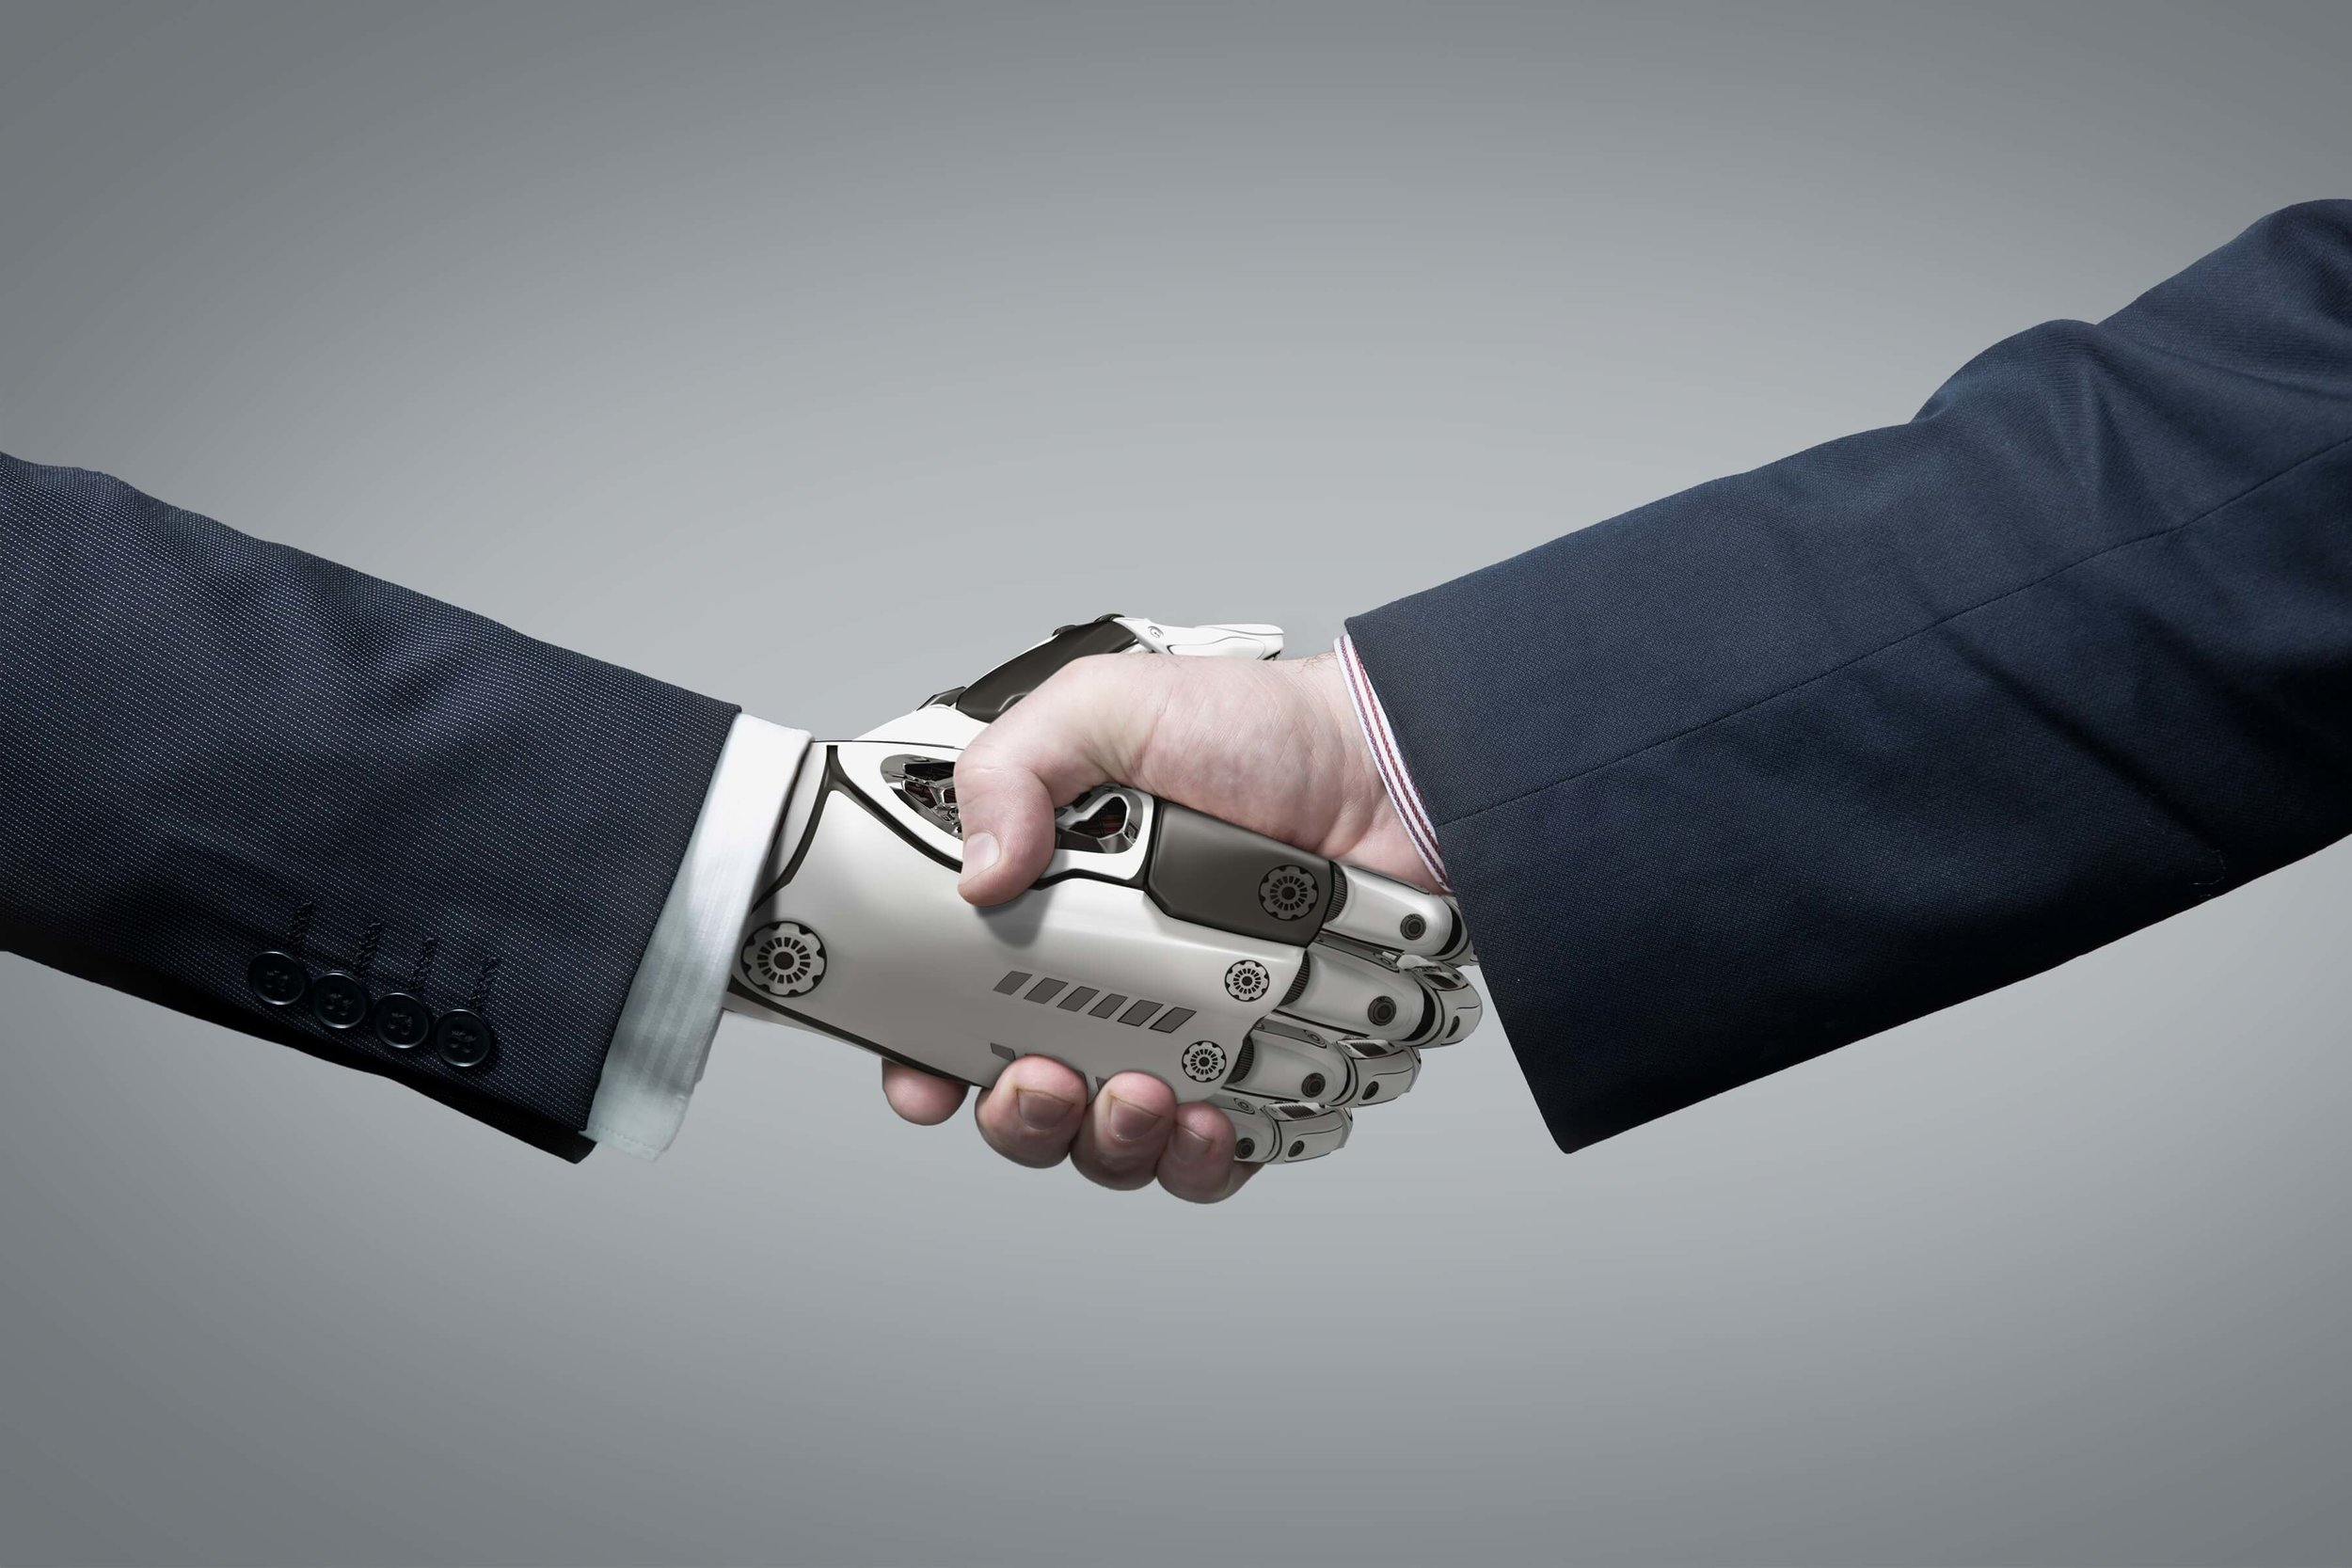 CiGen-robotic-process-automation-RPA-implementation-4-reasons-why-you-should-start-big.jpg